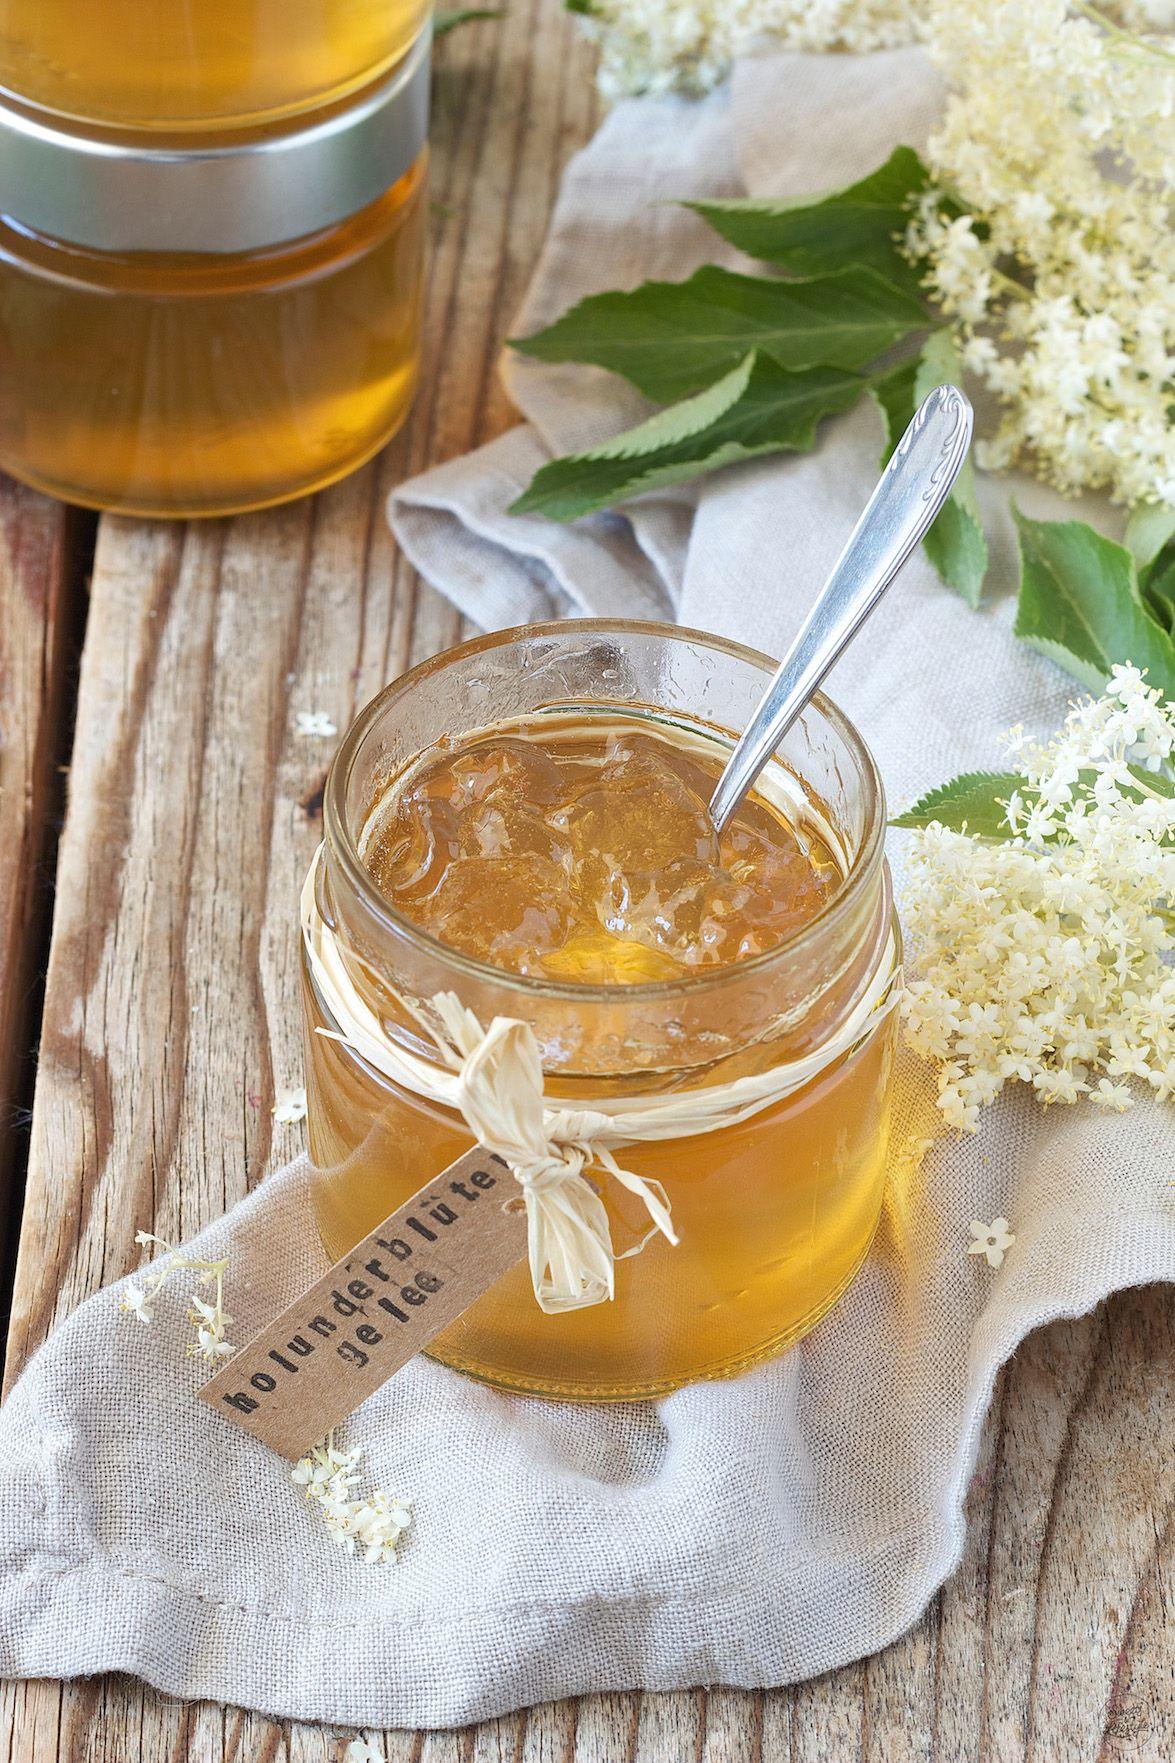 Holunderblütengelee - Sweets & Lifestyle® #homemadesweets